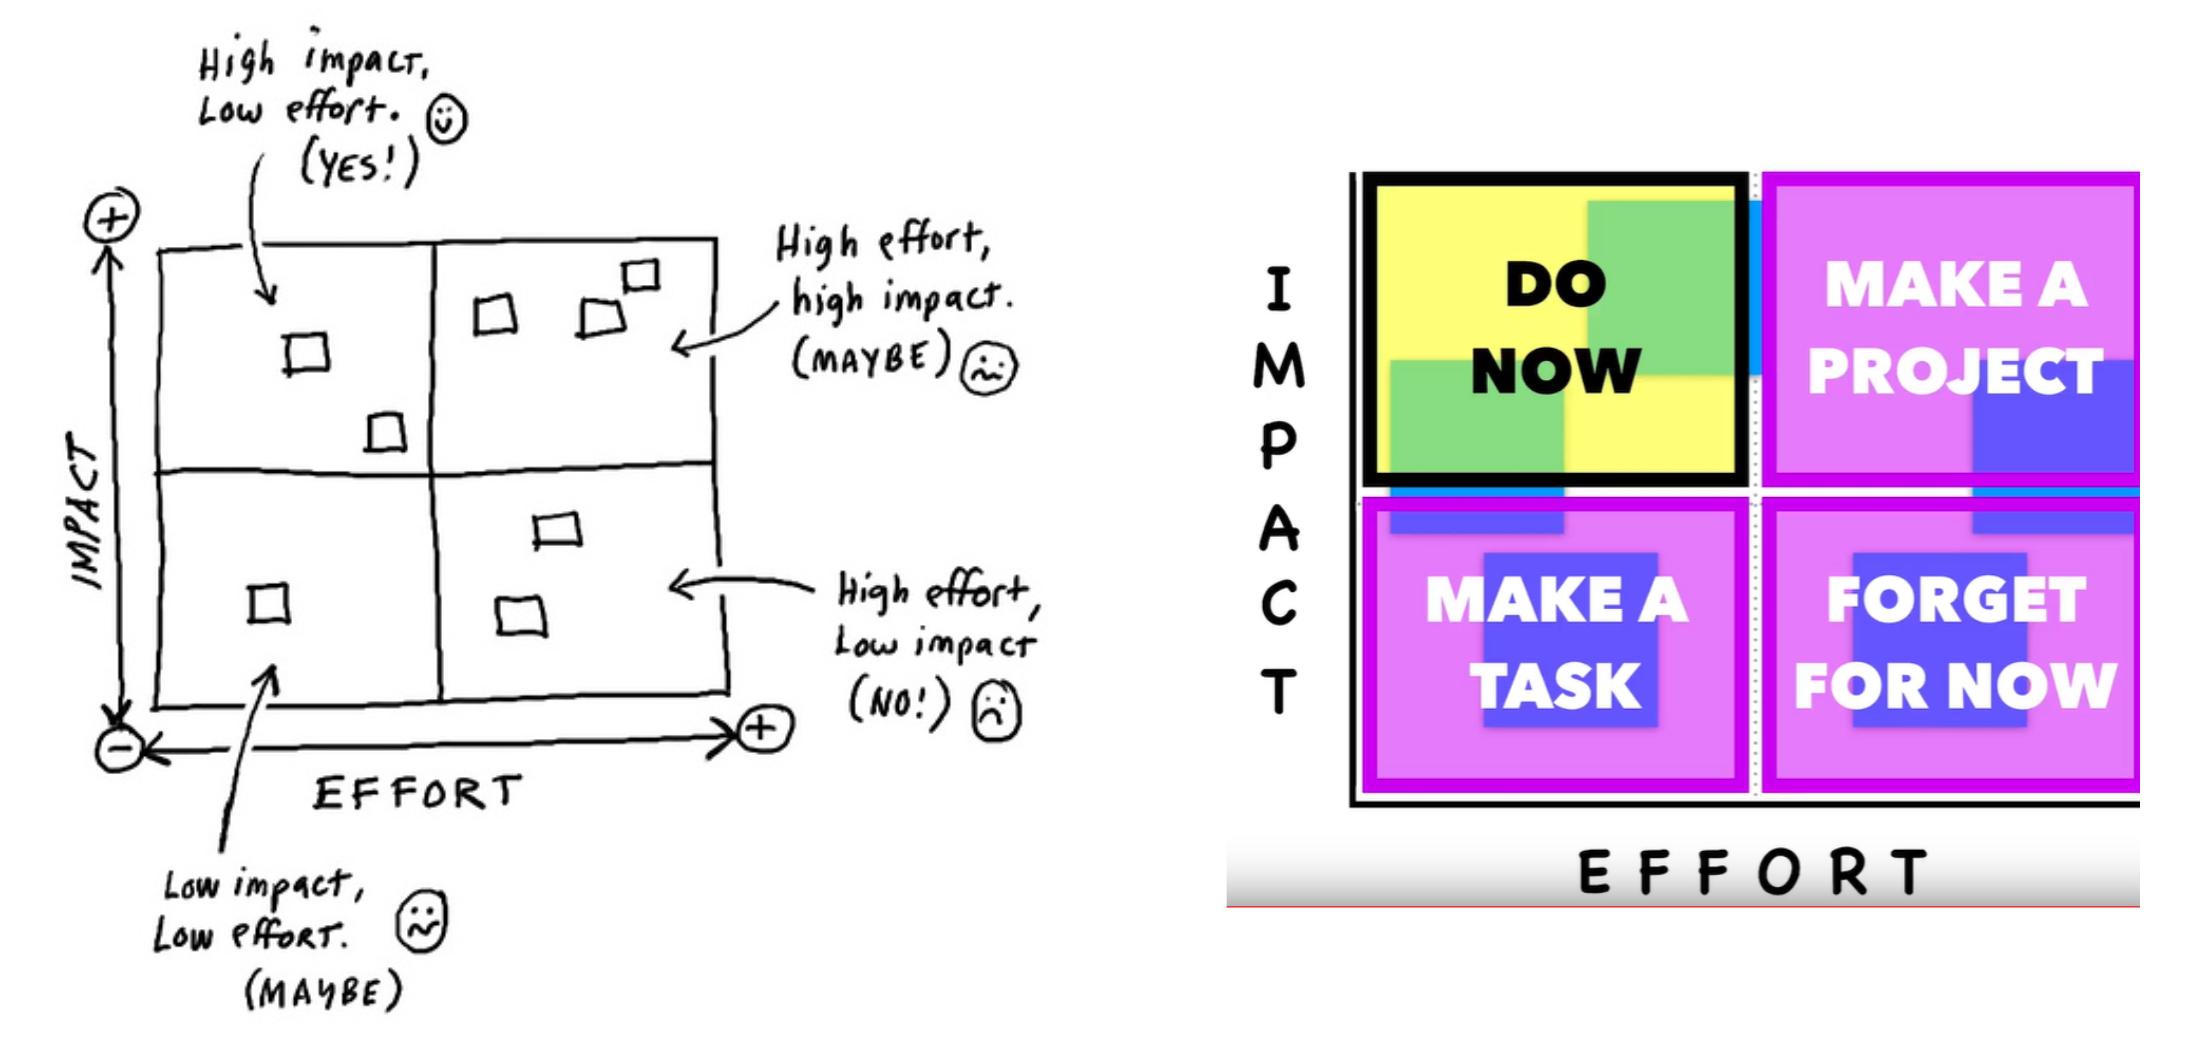 Impact effort example